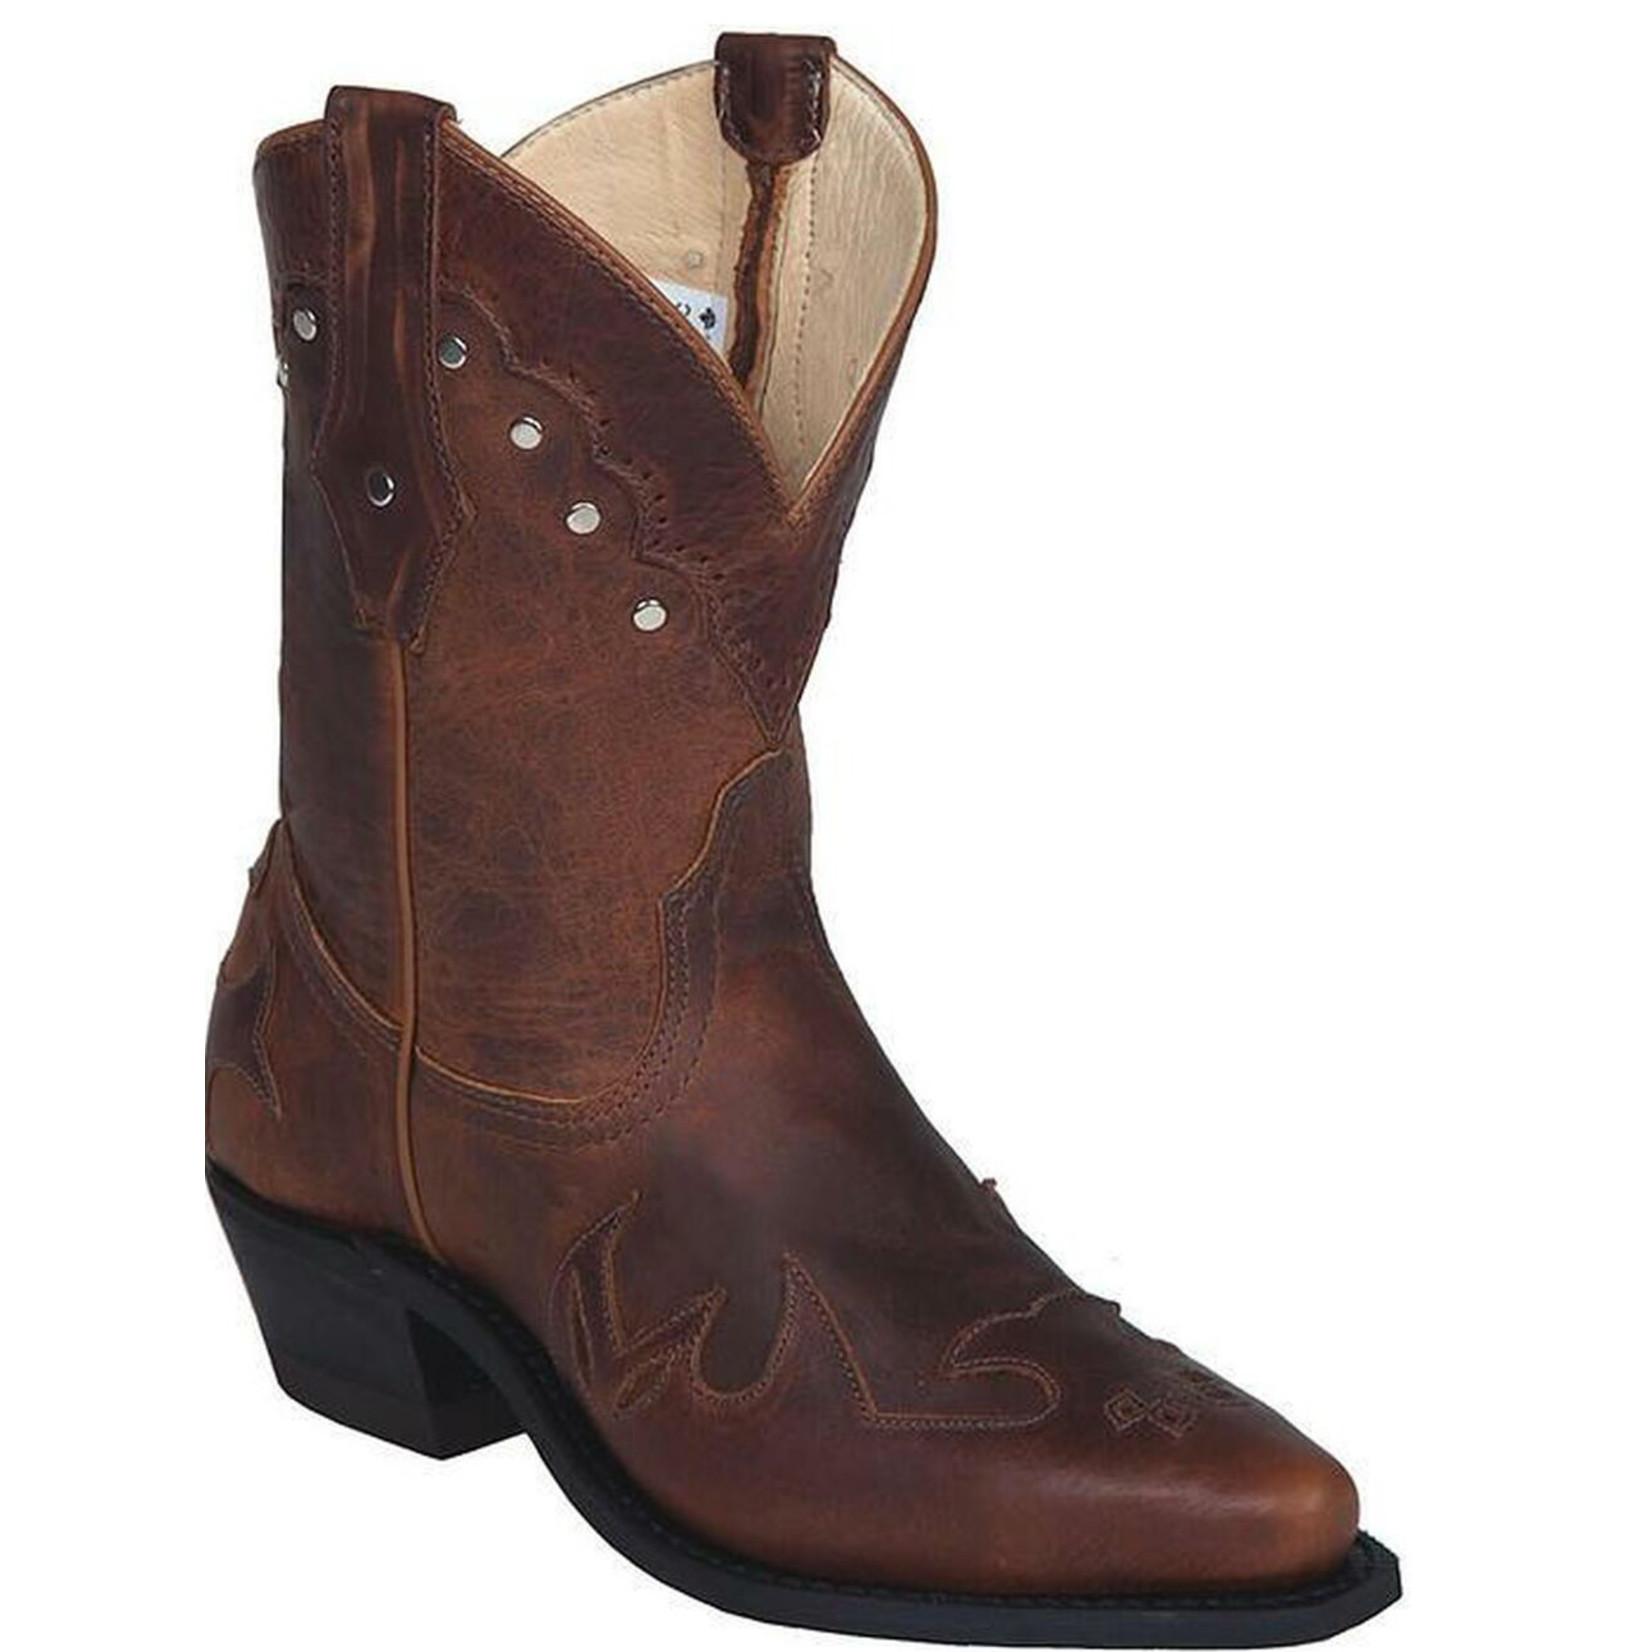 Canada West Canada West Women's Brown Western Boot C 3056